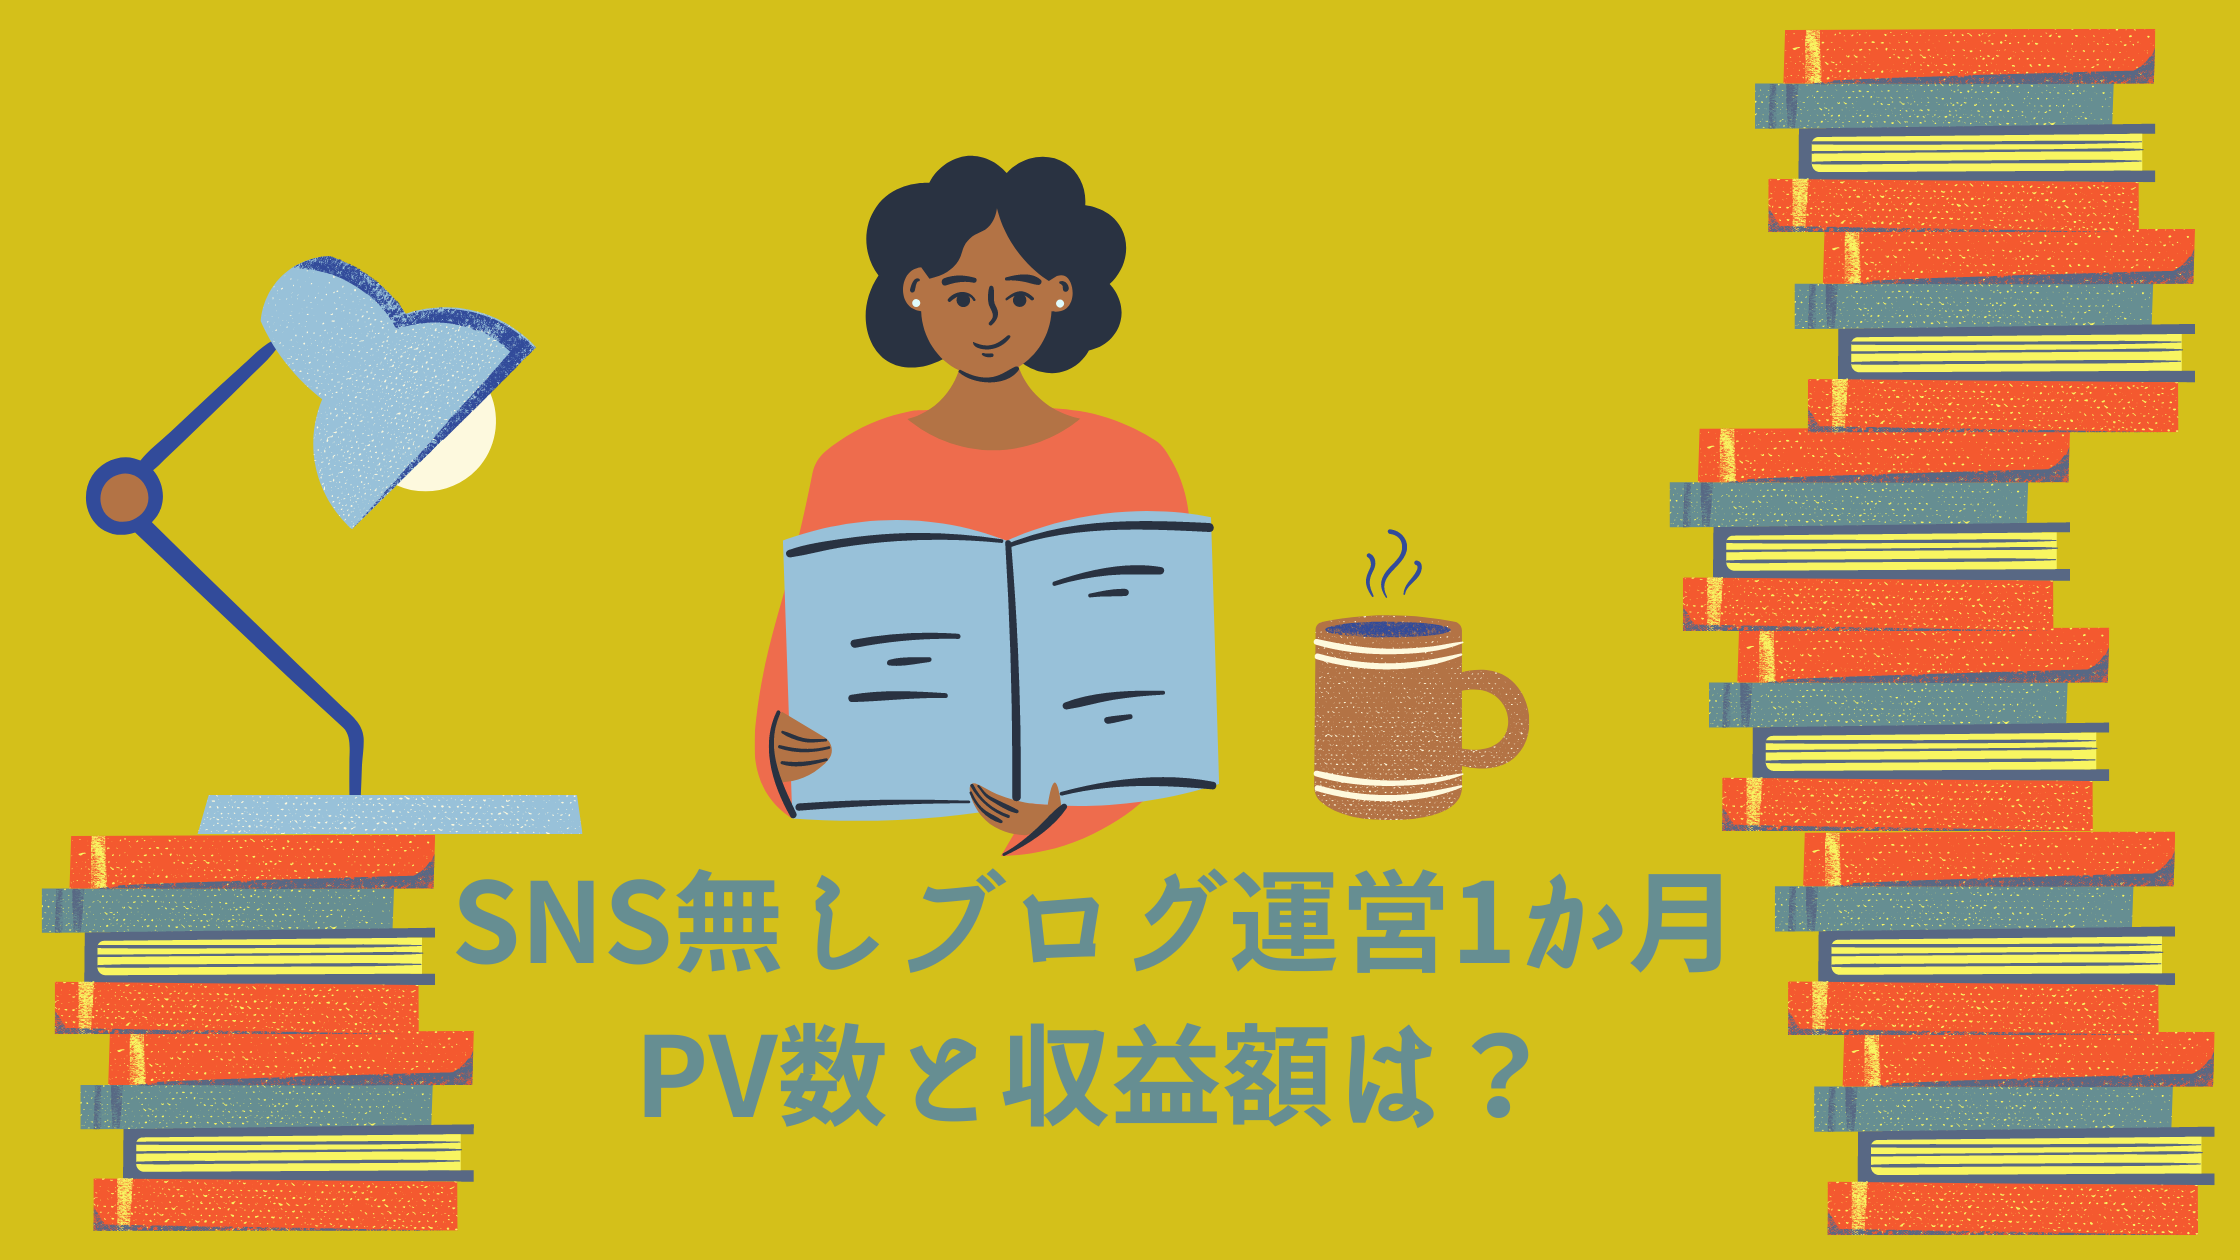 SNS無しブログ運営1か月 PV数と収益額は?